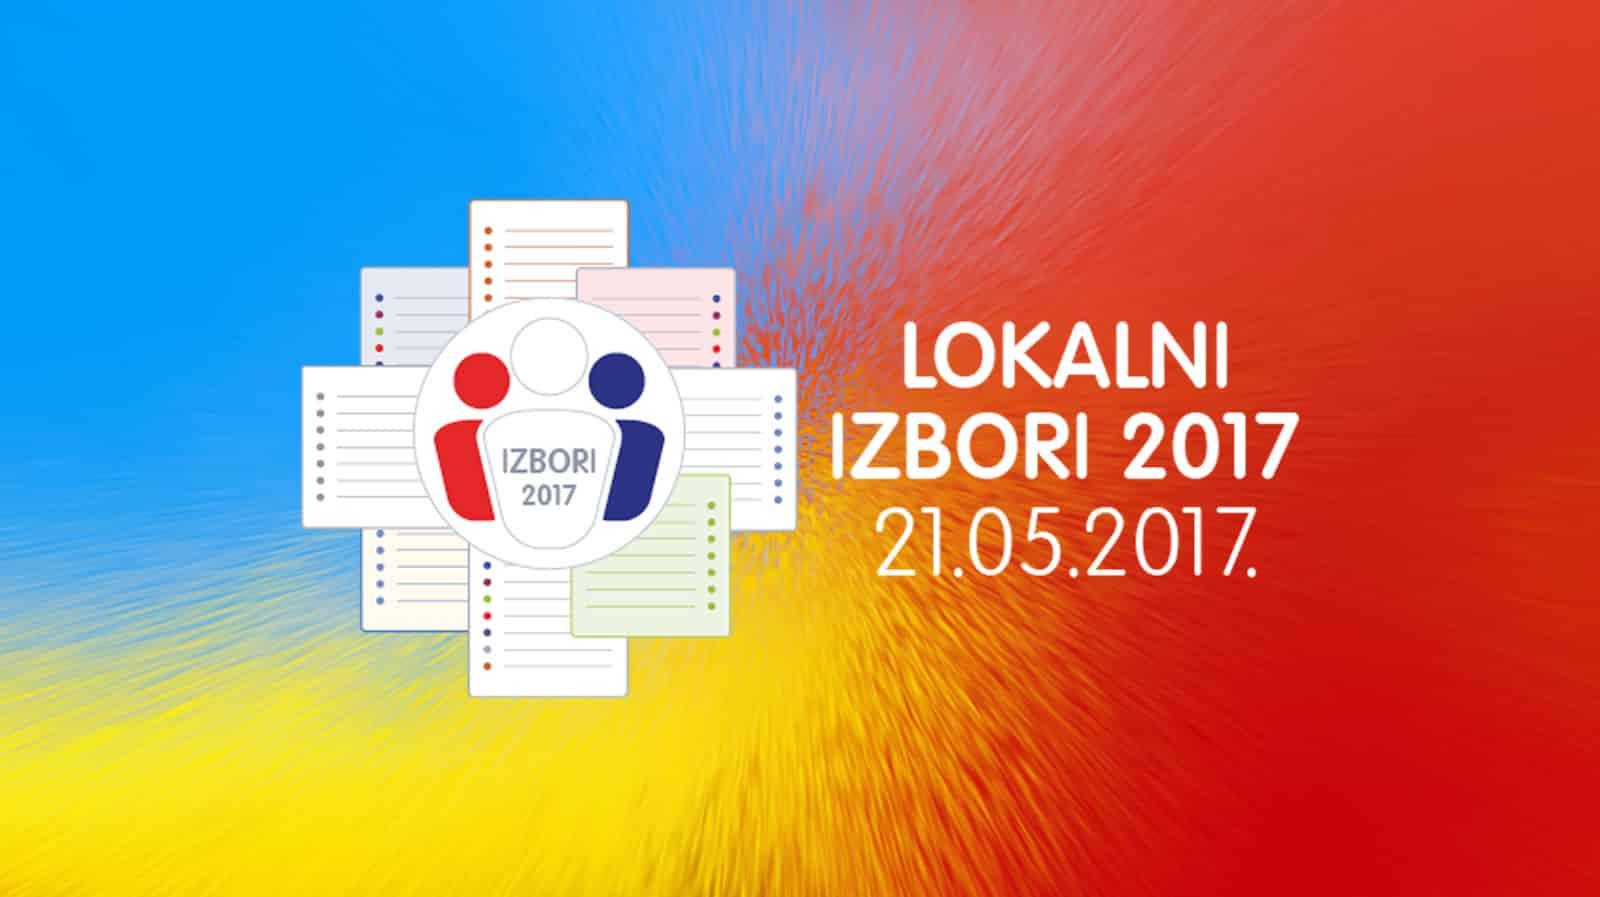 Lokalni-izbori-2017-grafika